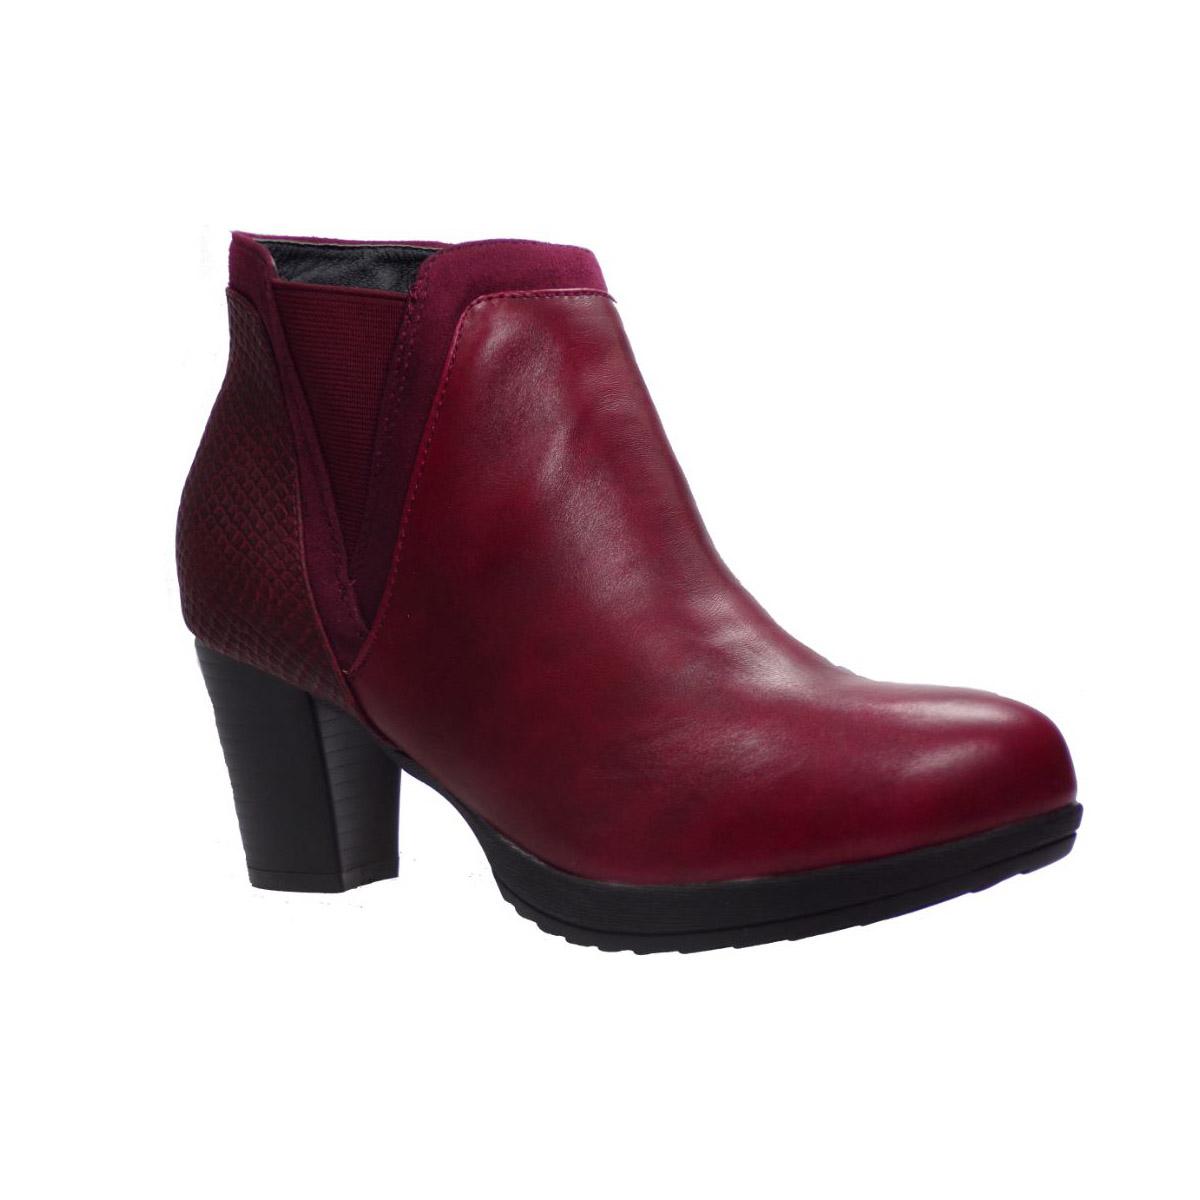 aab1a86aa0b Προσφορά από το BagiotaShoes σε - Envie Γυναικεία Παπούτσια Μποτάκια  24-0634 Μπορντώ Envie 24